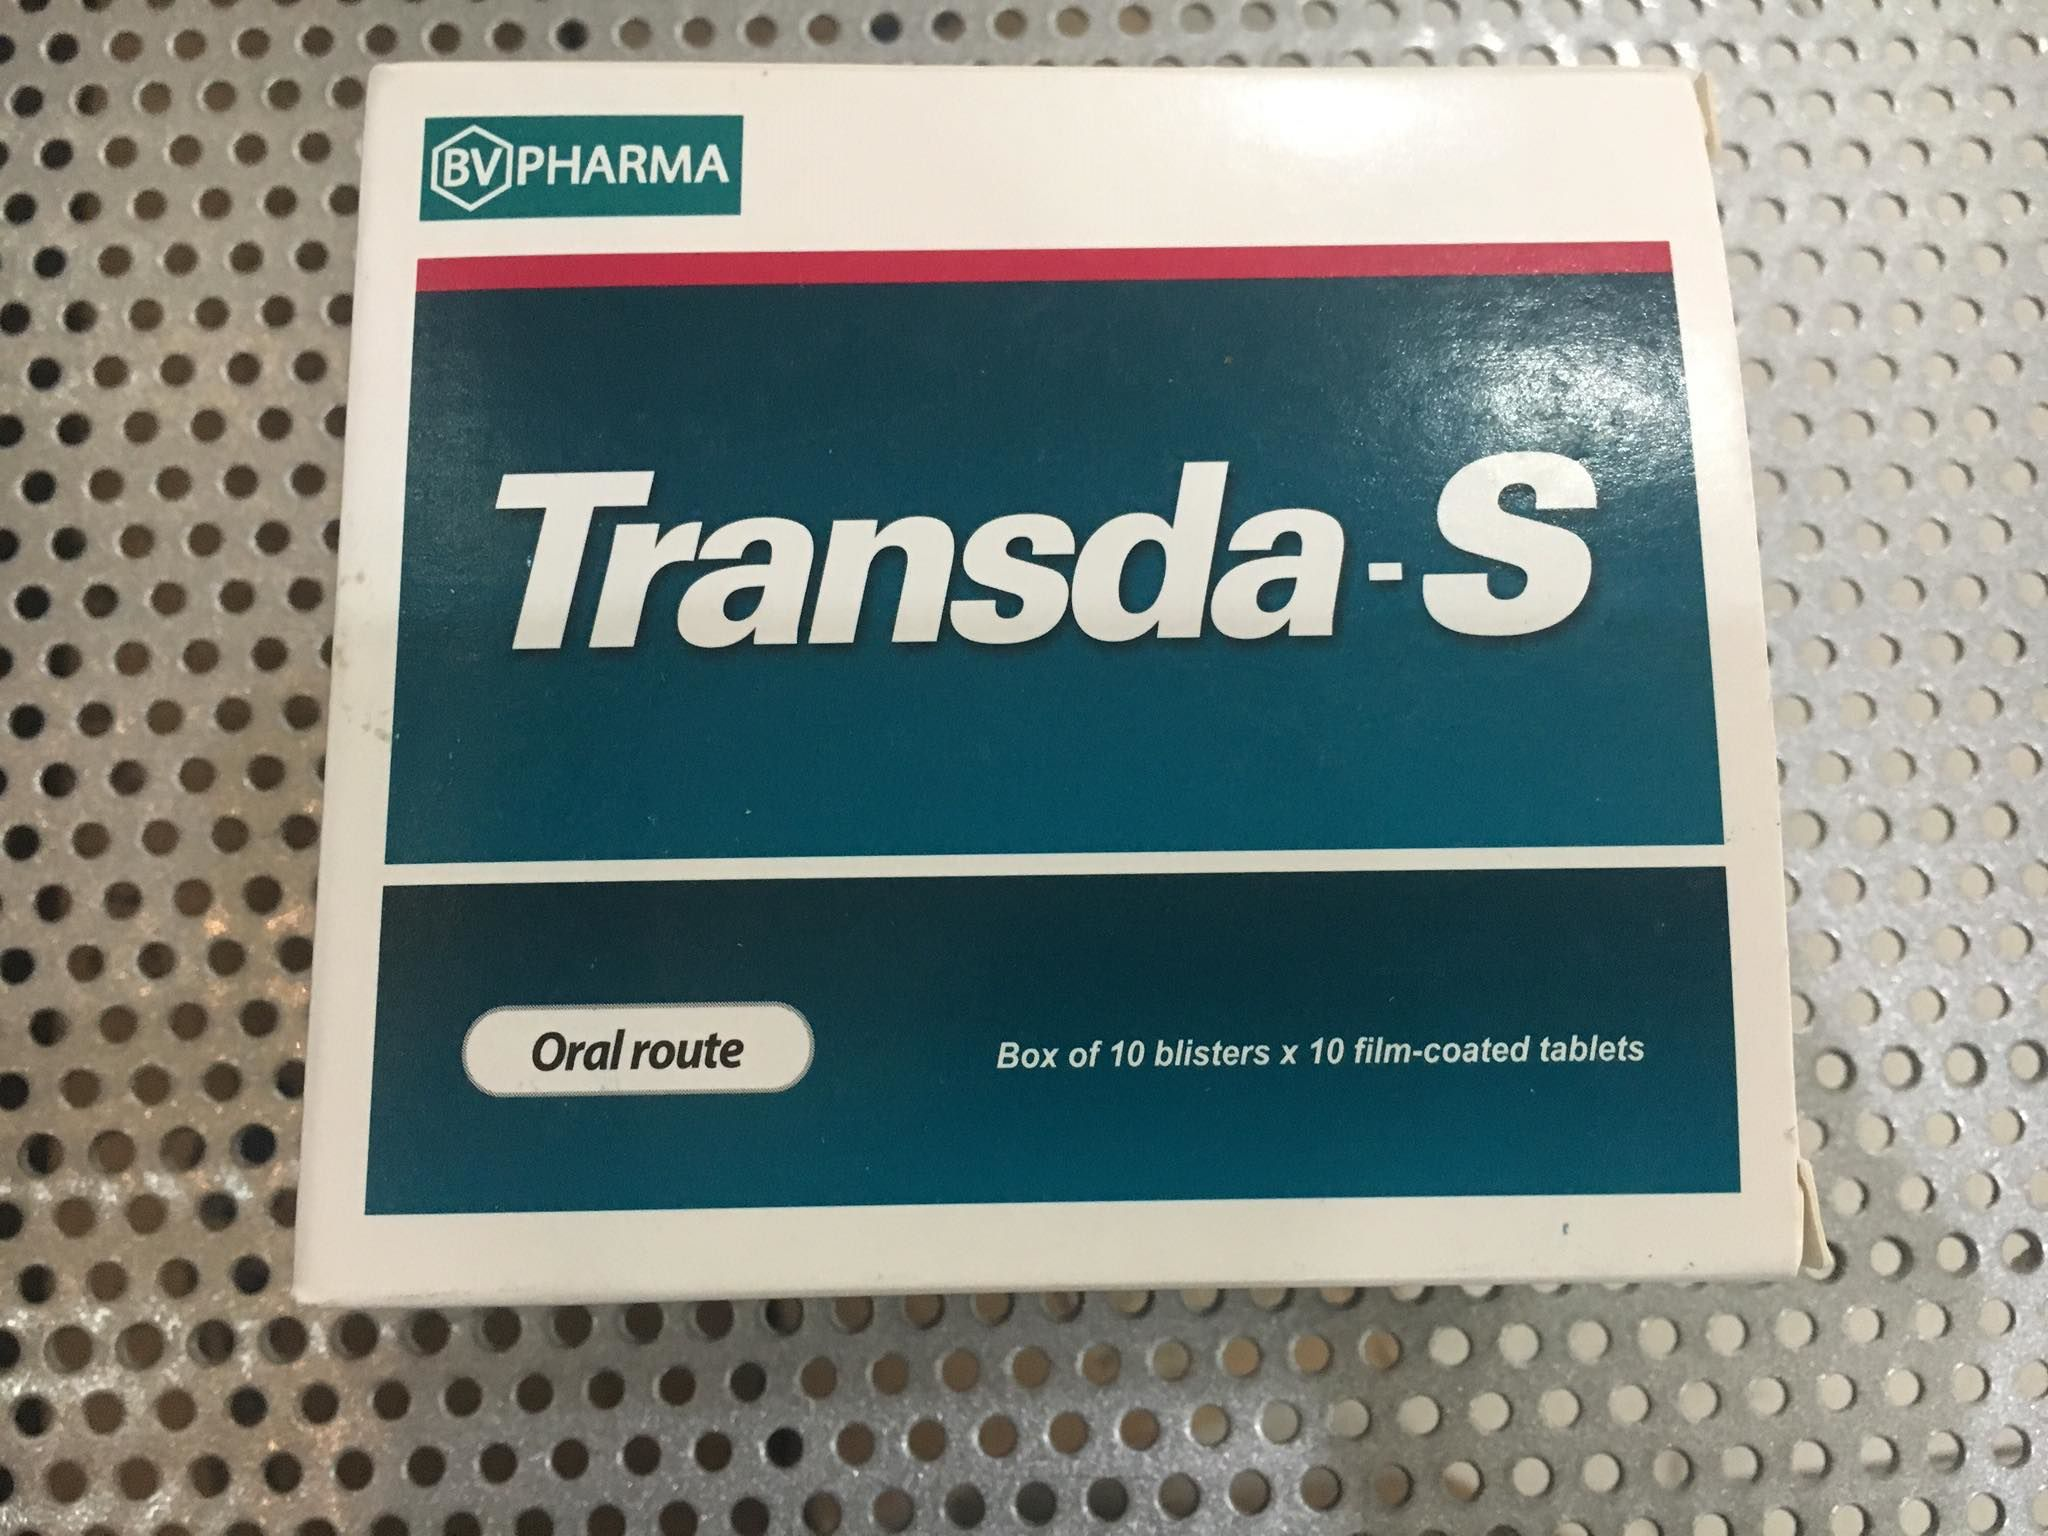 Transda S